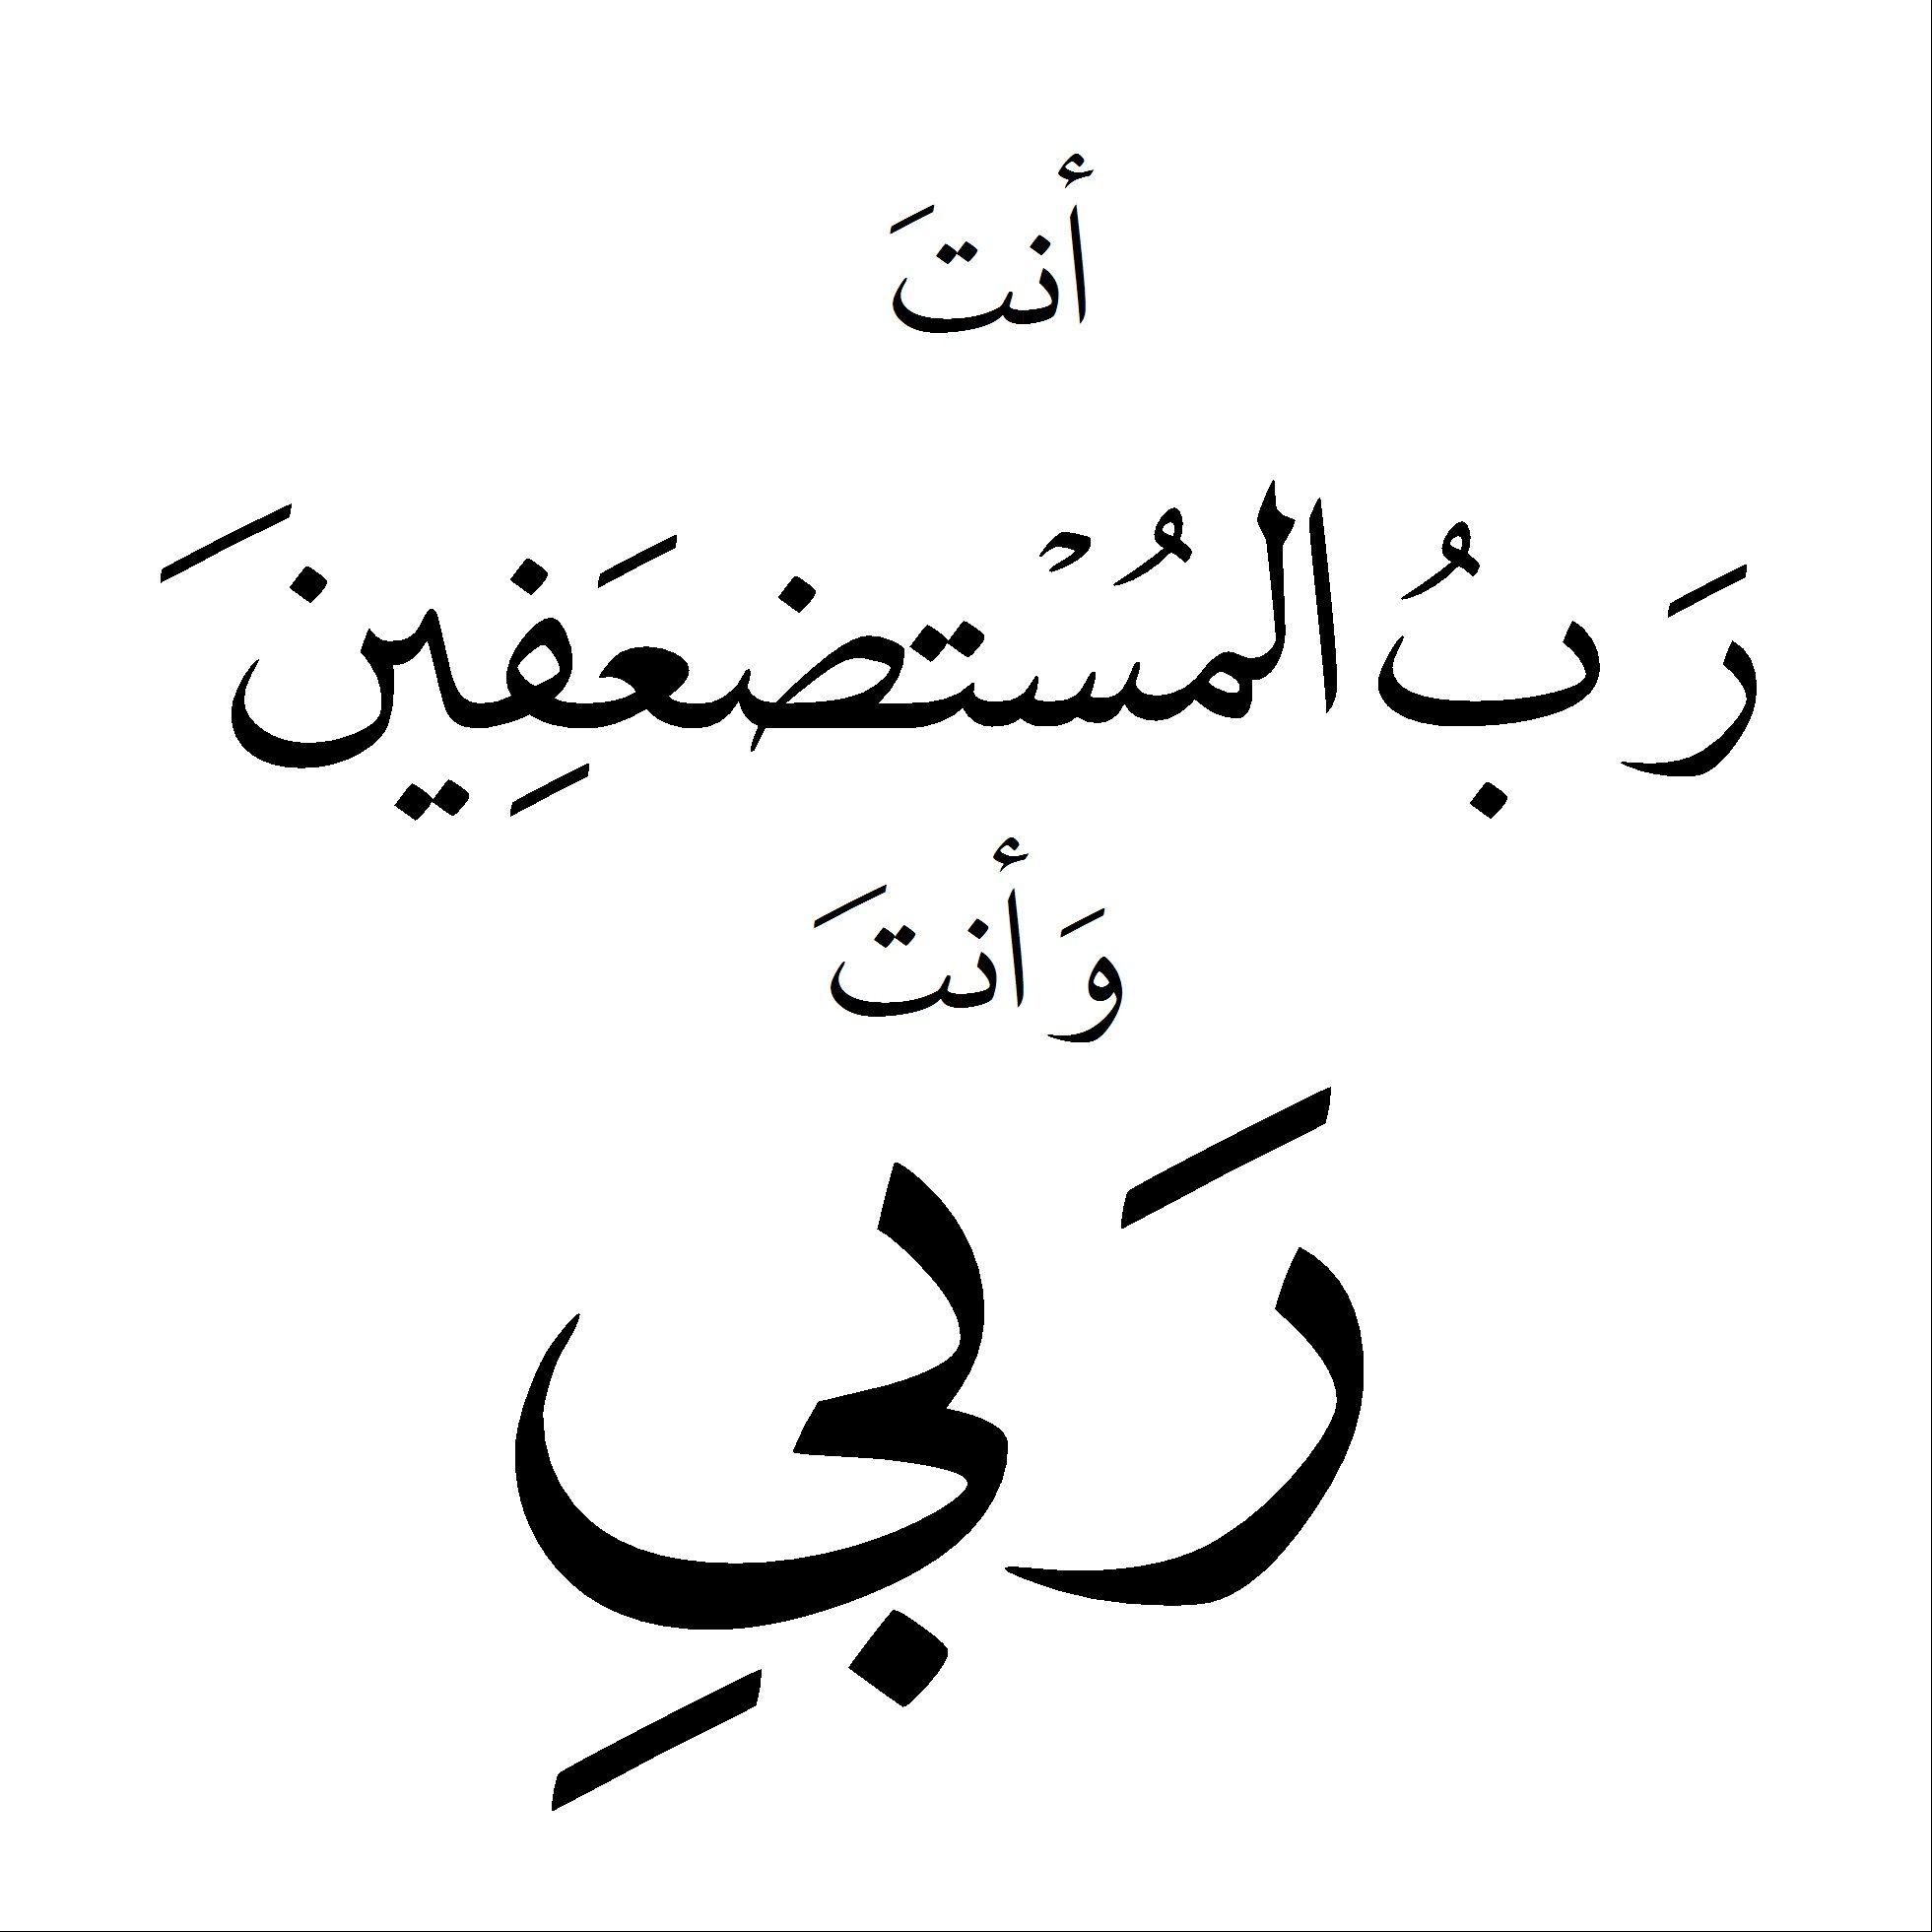 Pinterest Com Christiancross دعاء الرسول انت رب المستضعفين و انت ربى Islamic Inspirational Quotes Islamic Quotes Words